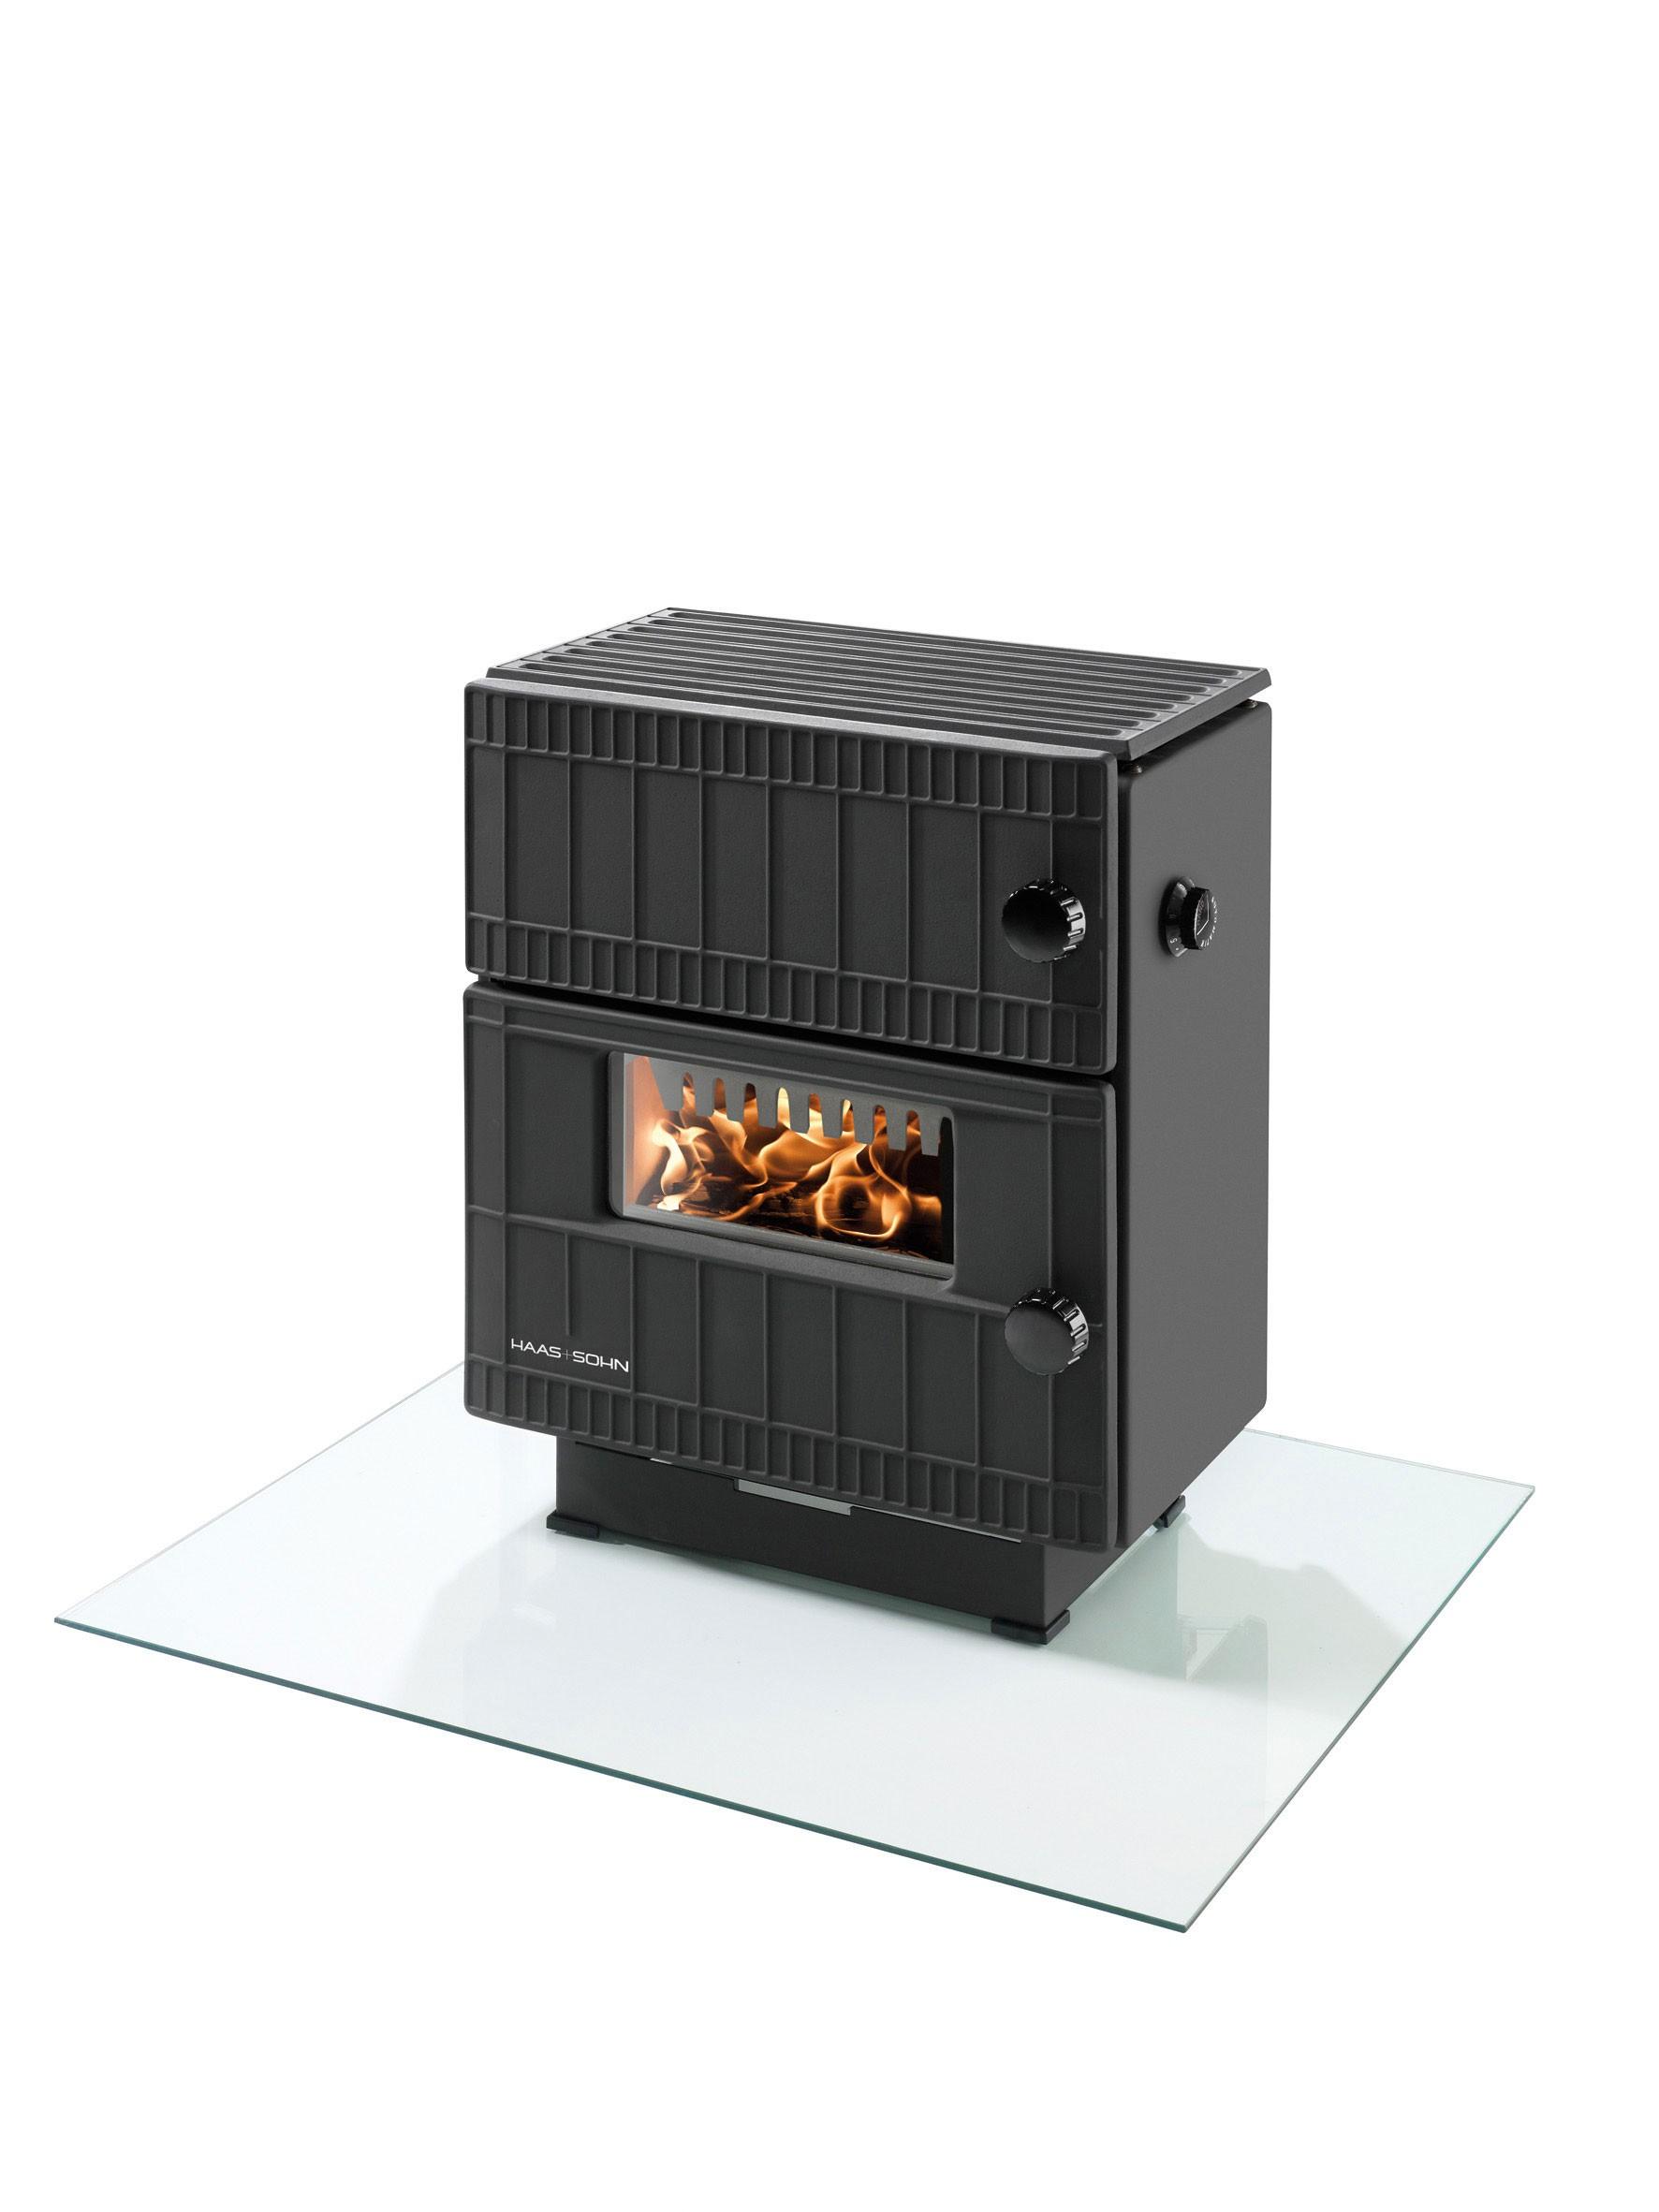 dauerbrandofen haas sohn bernau schwarz 7kw mit unterlegplatte bei. Black Bedroom Furniture Sets. Home Design Ideas